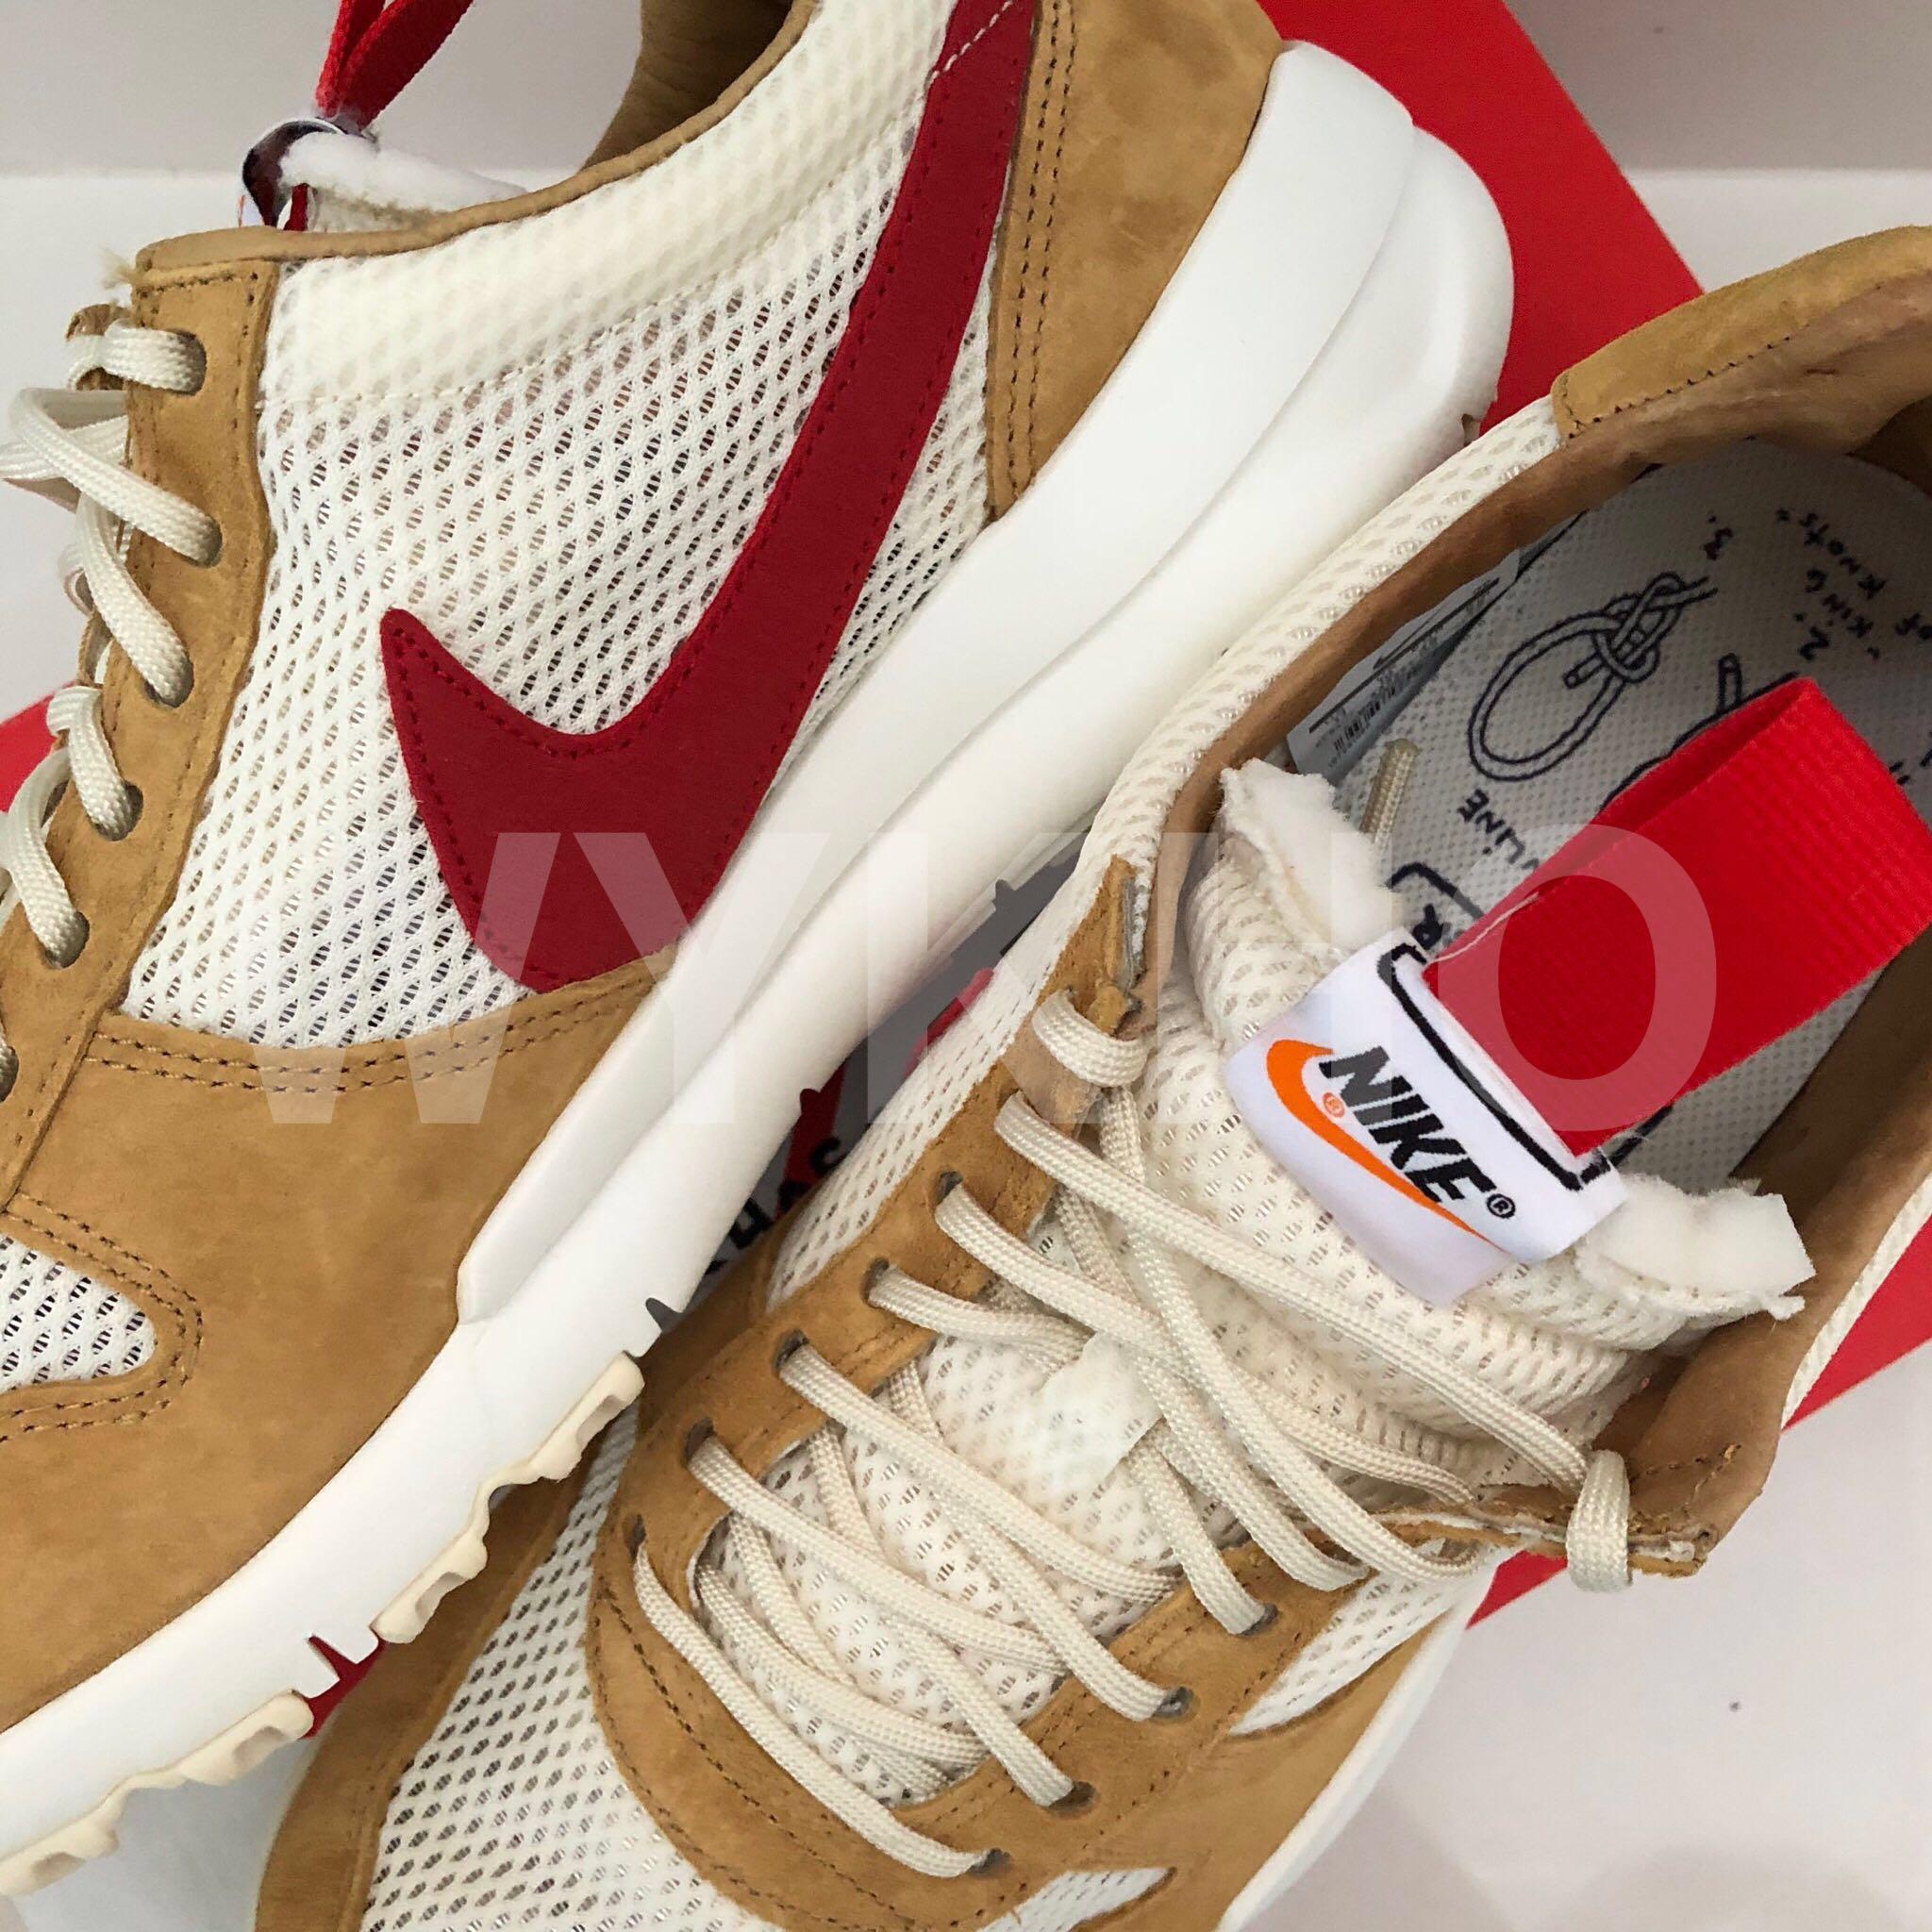 d1889d8fec3 Tom Sachs x NikeCraft  Mars Yard Shoe 2.0